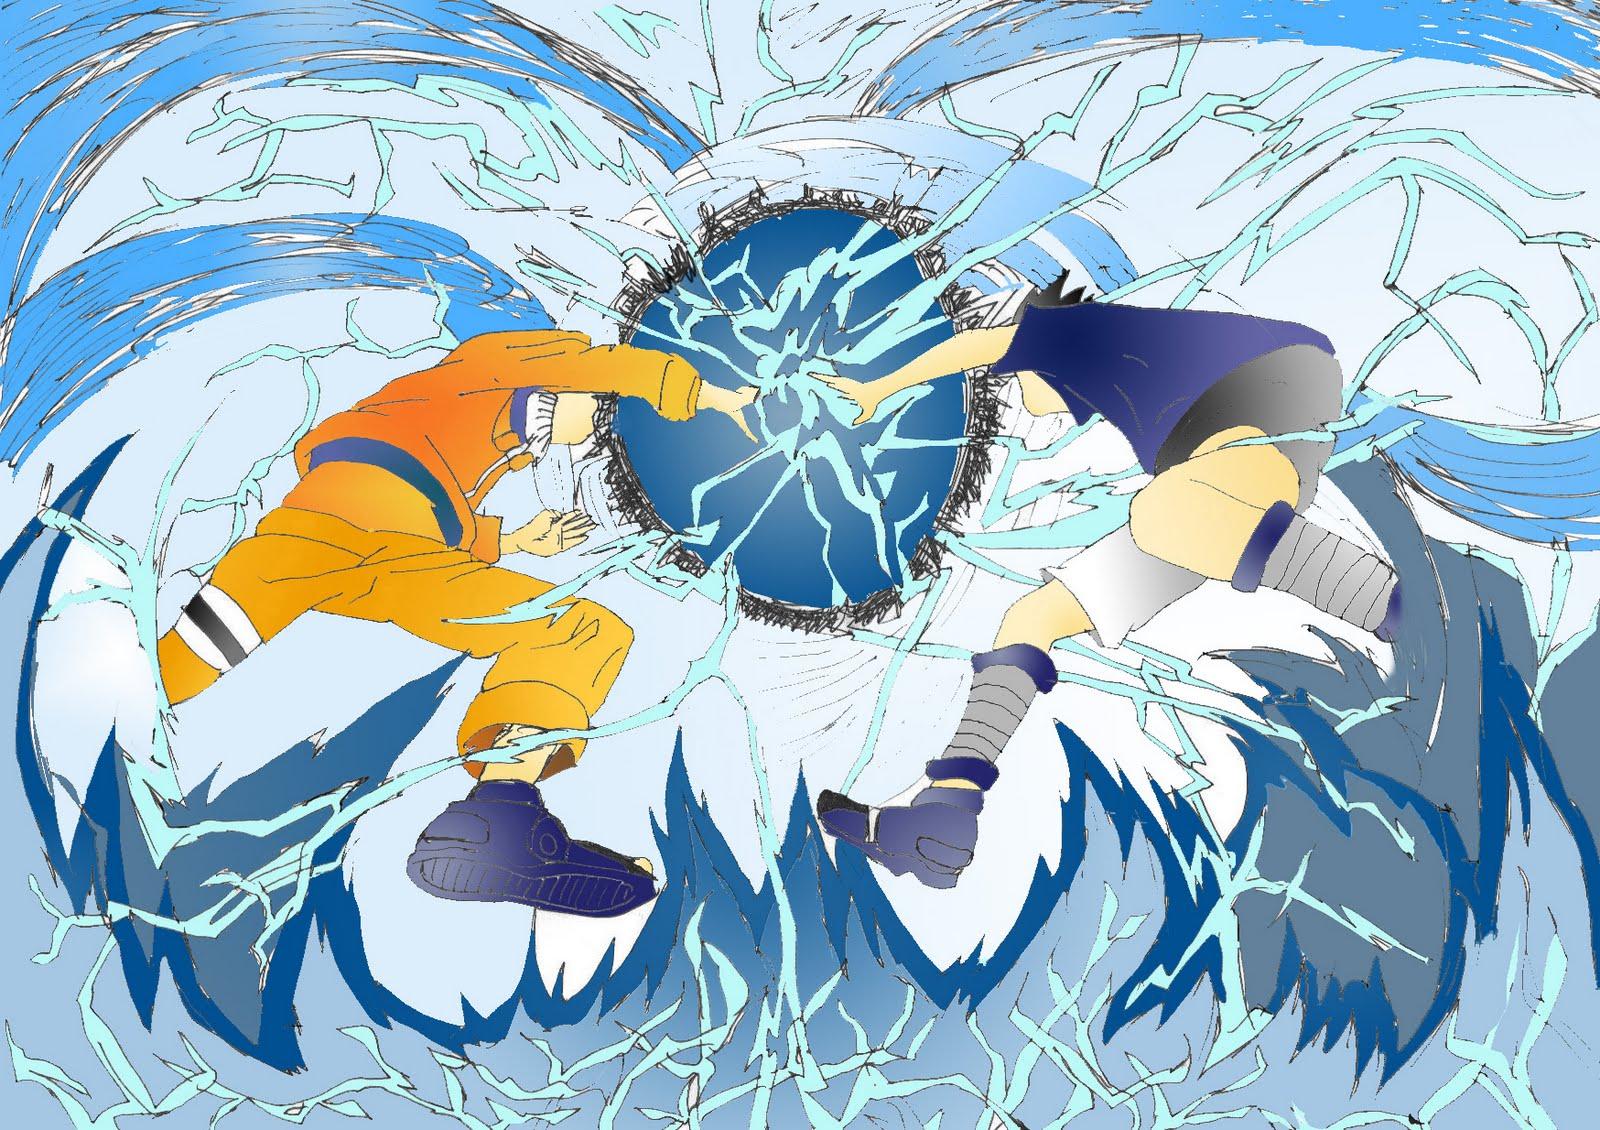 naruto vs sasuke wallpaper hd wallpaper collection